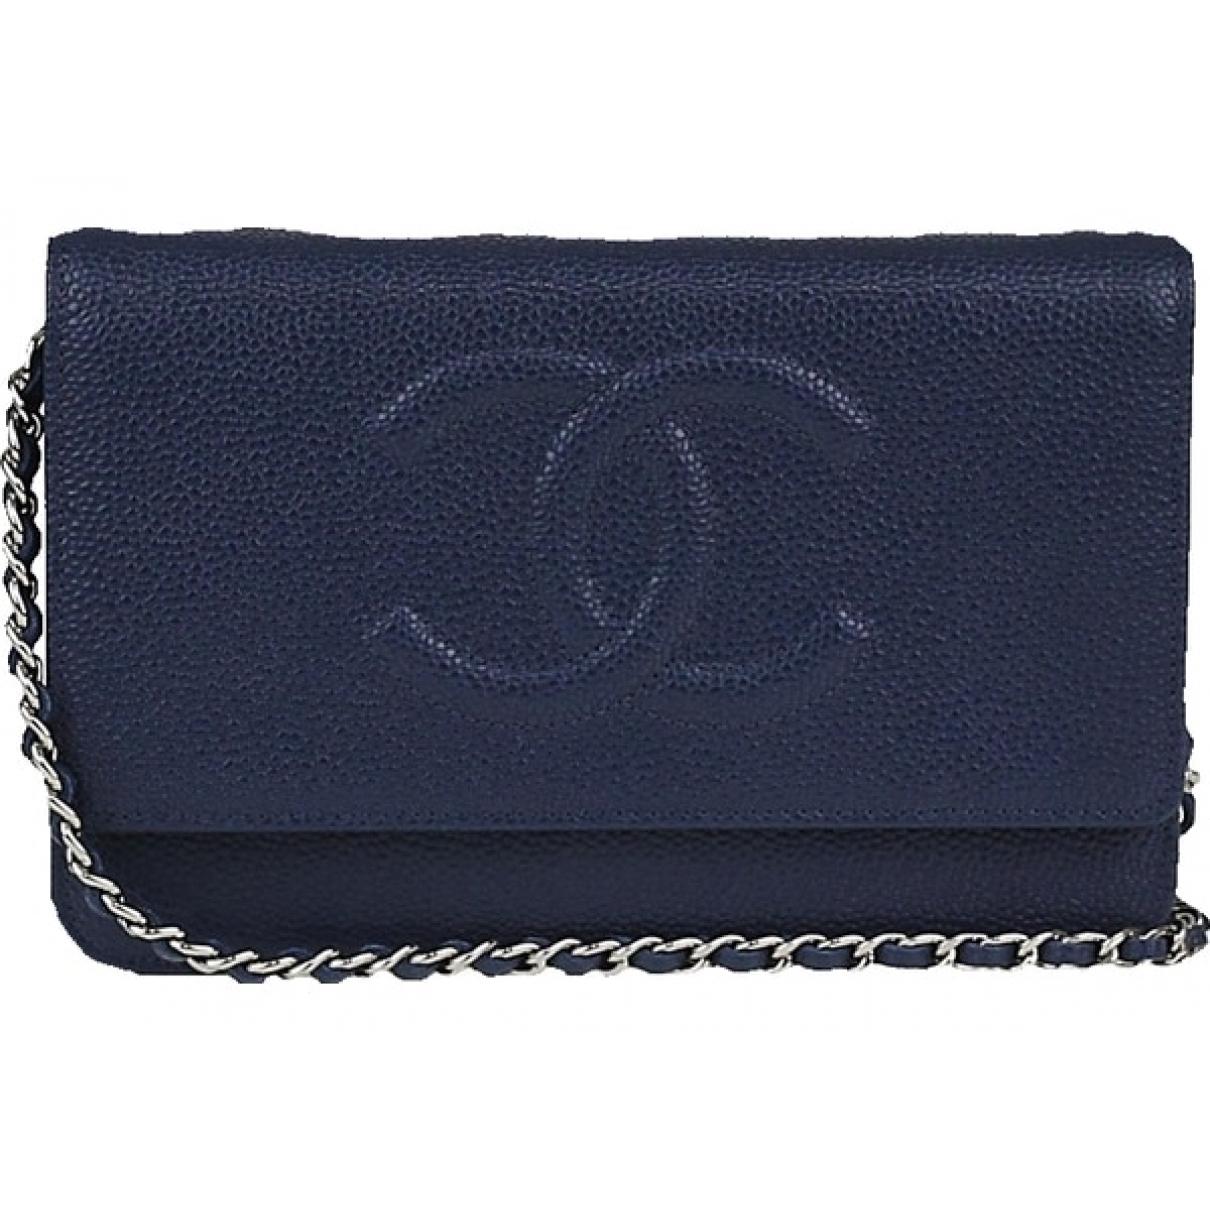 Chanel - Pochette Wallet on Chain pour femme en cuir - marine